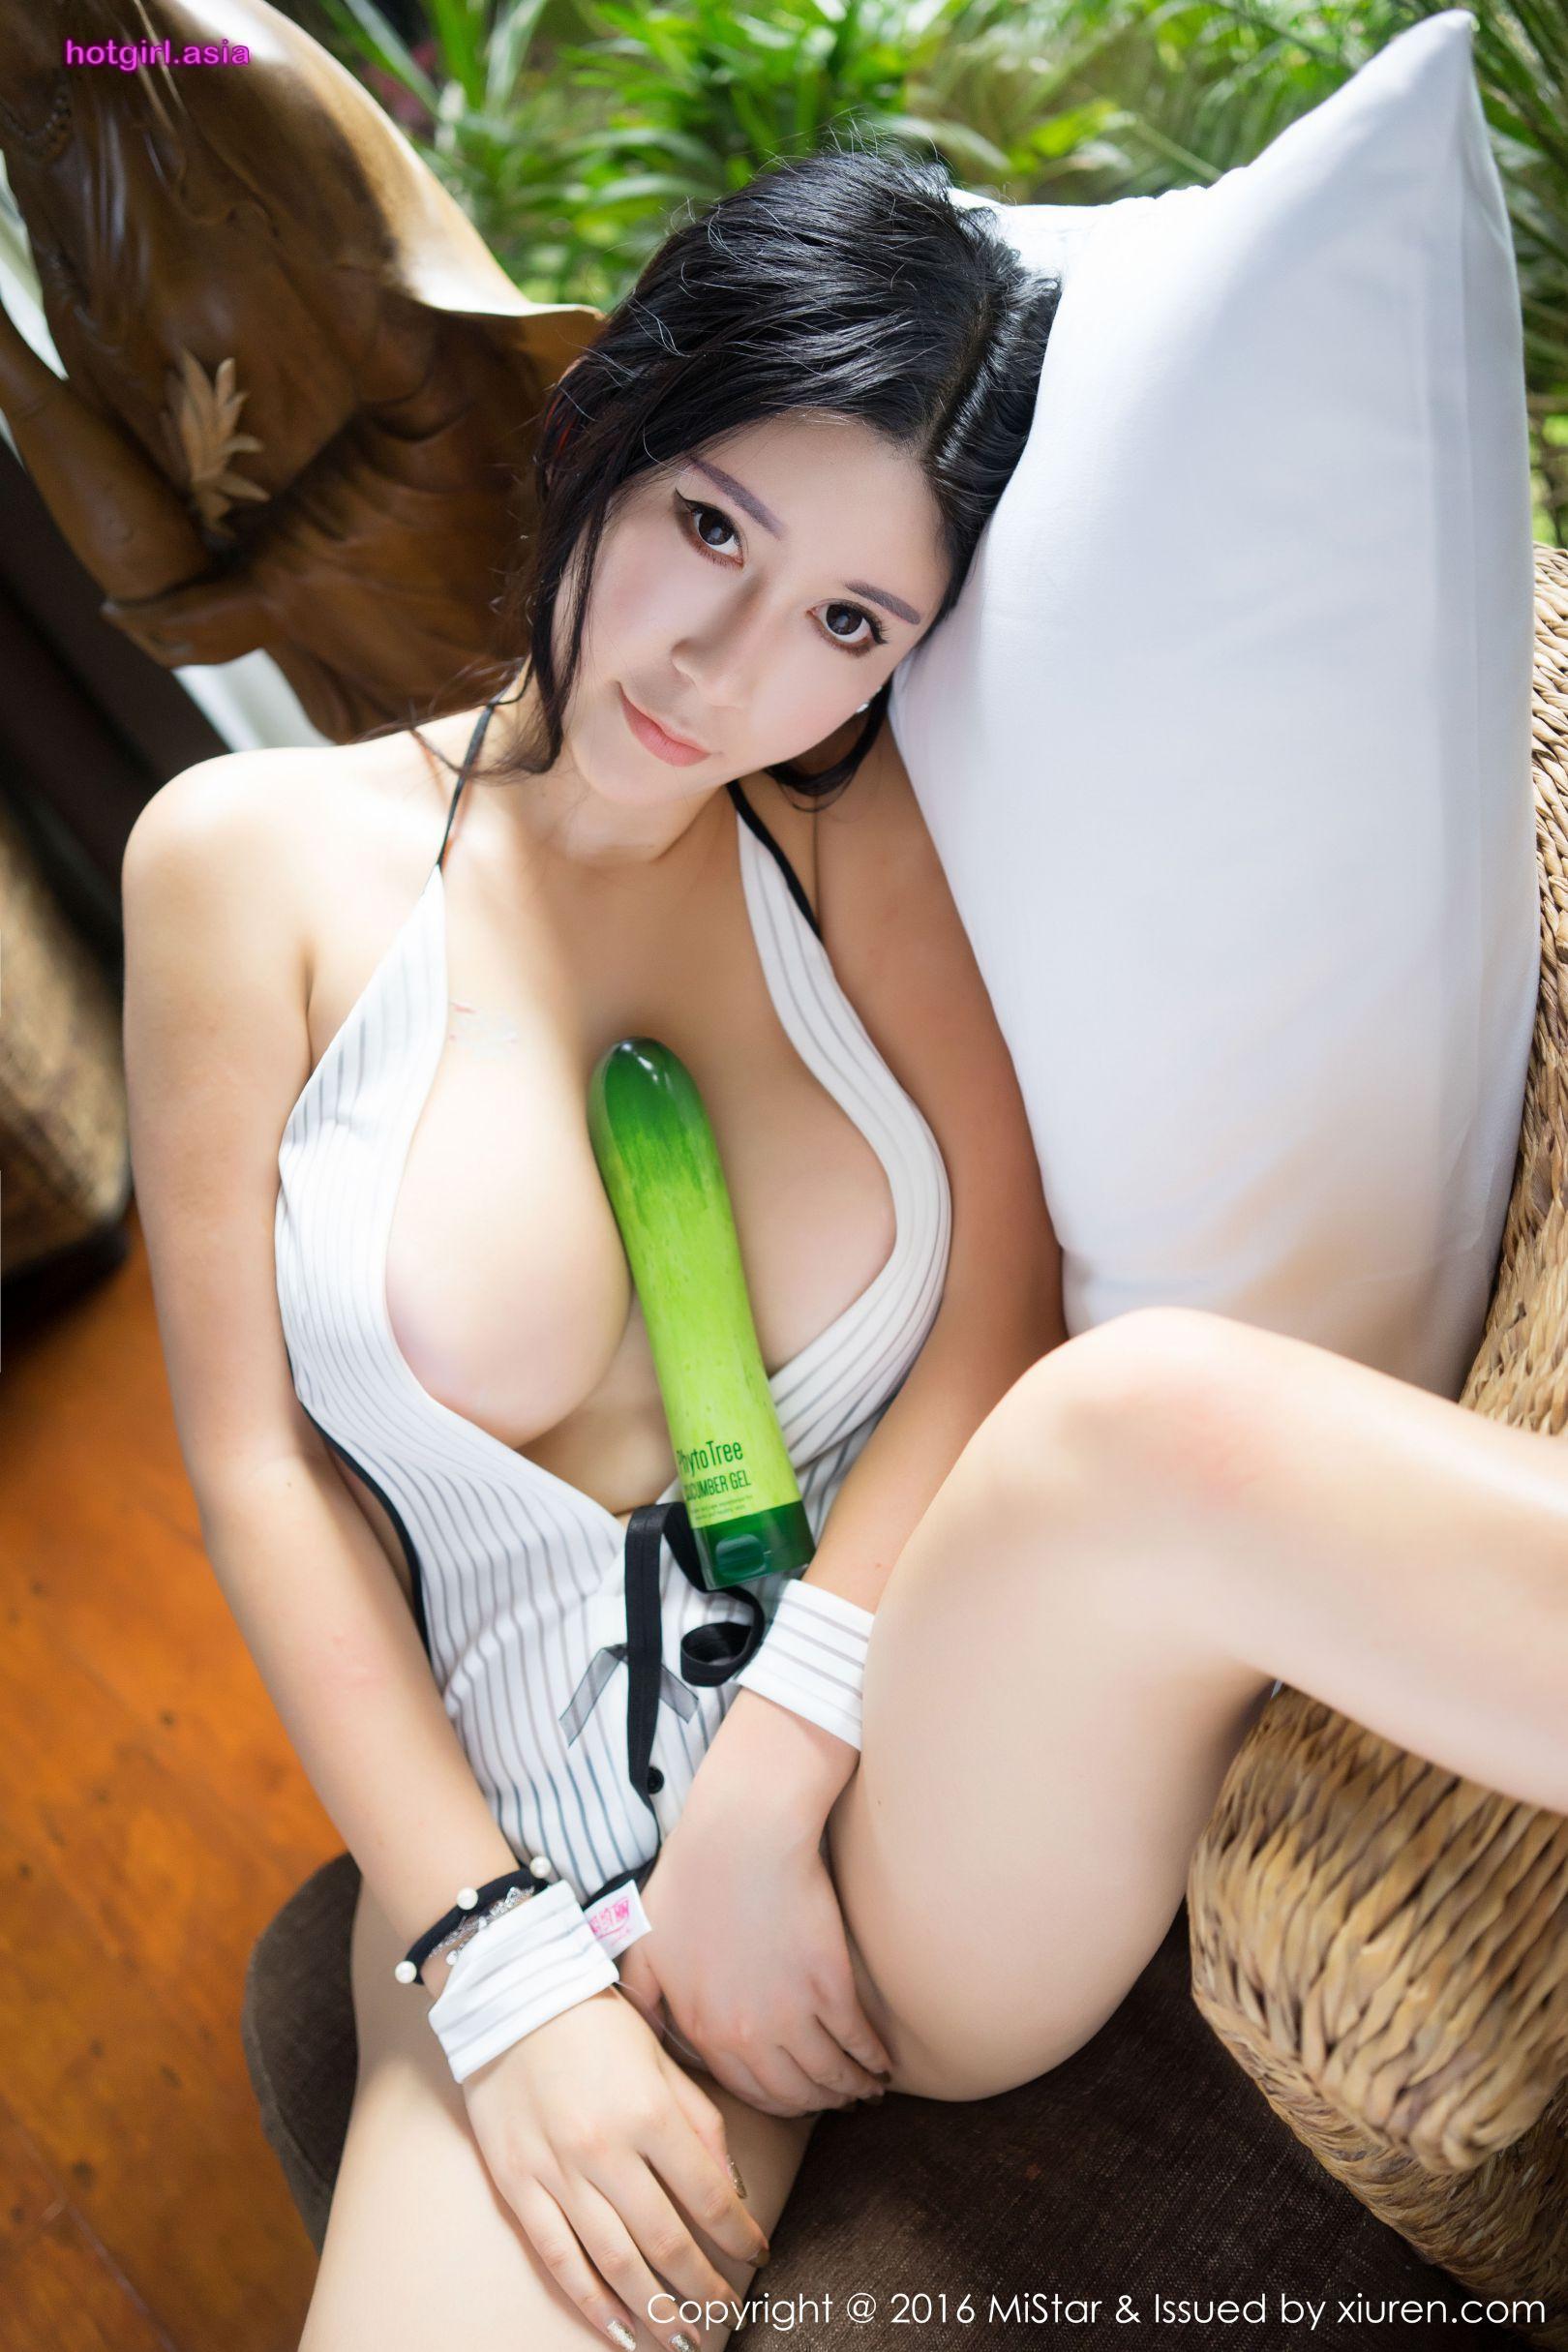 [MiStar 魅妍社] Vol.144 Abby 李雅 – Net red tender model photo set